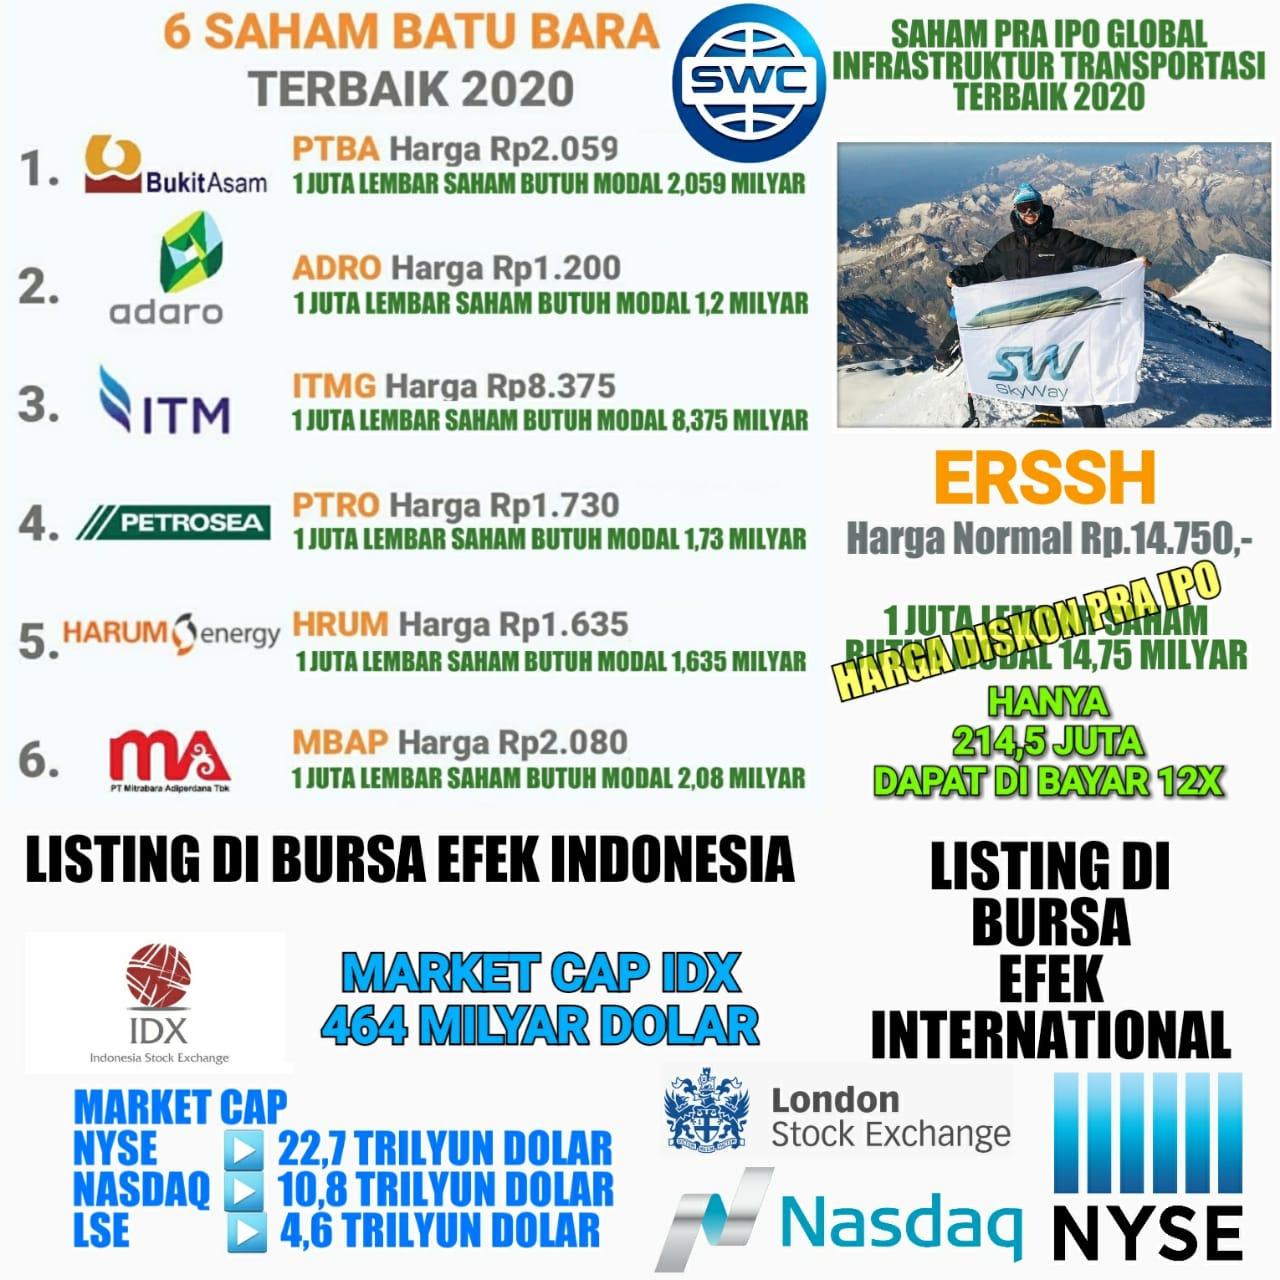 Saham Pra IPO Global InfrakStruktur Terbaik 2020